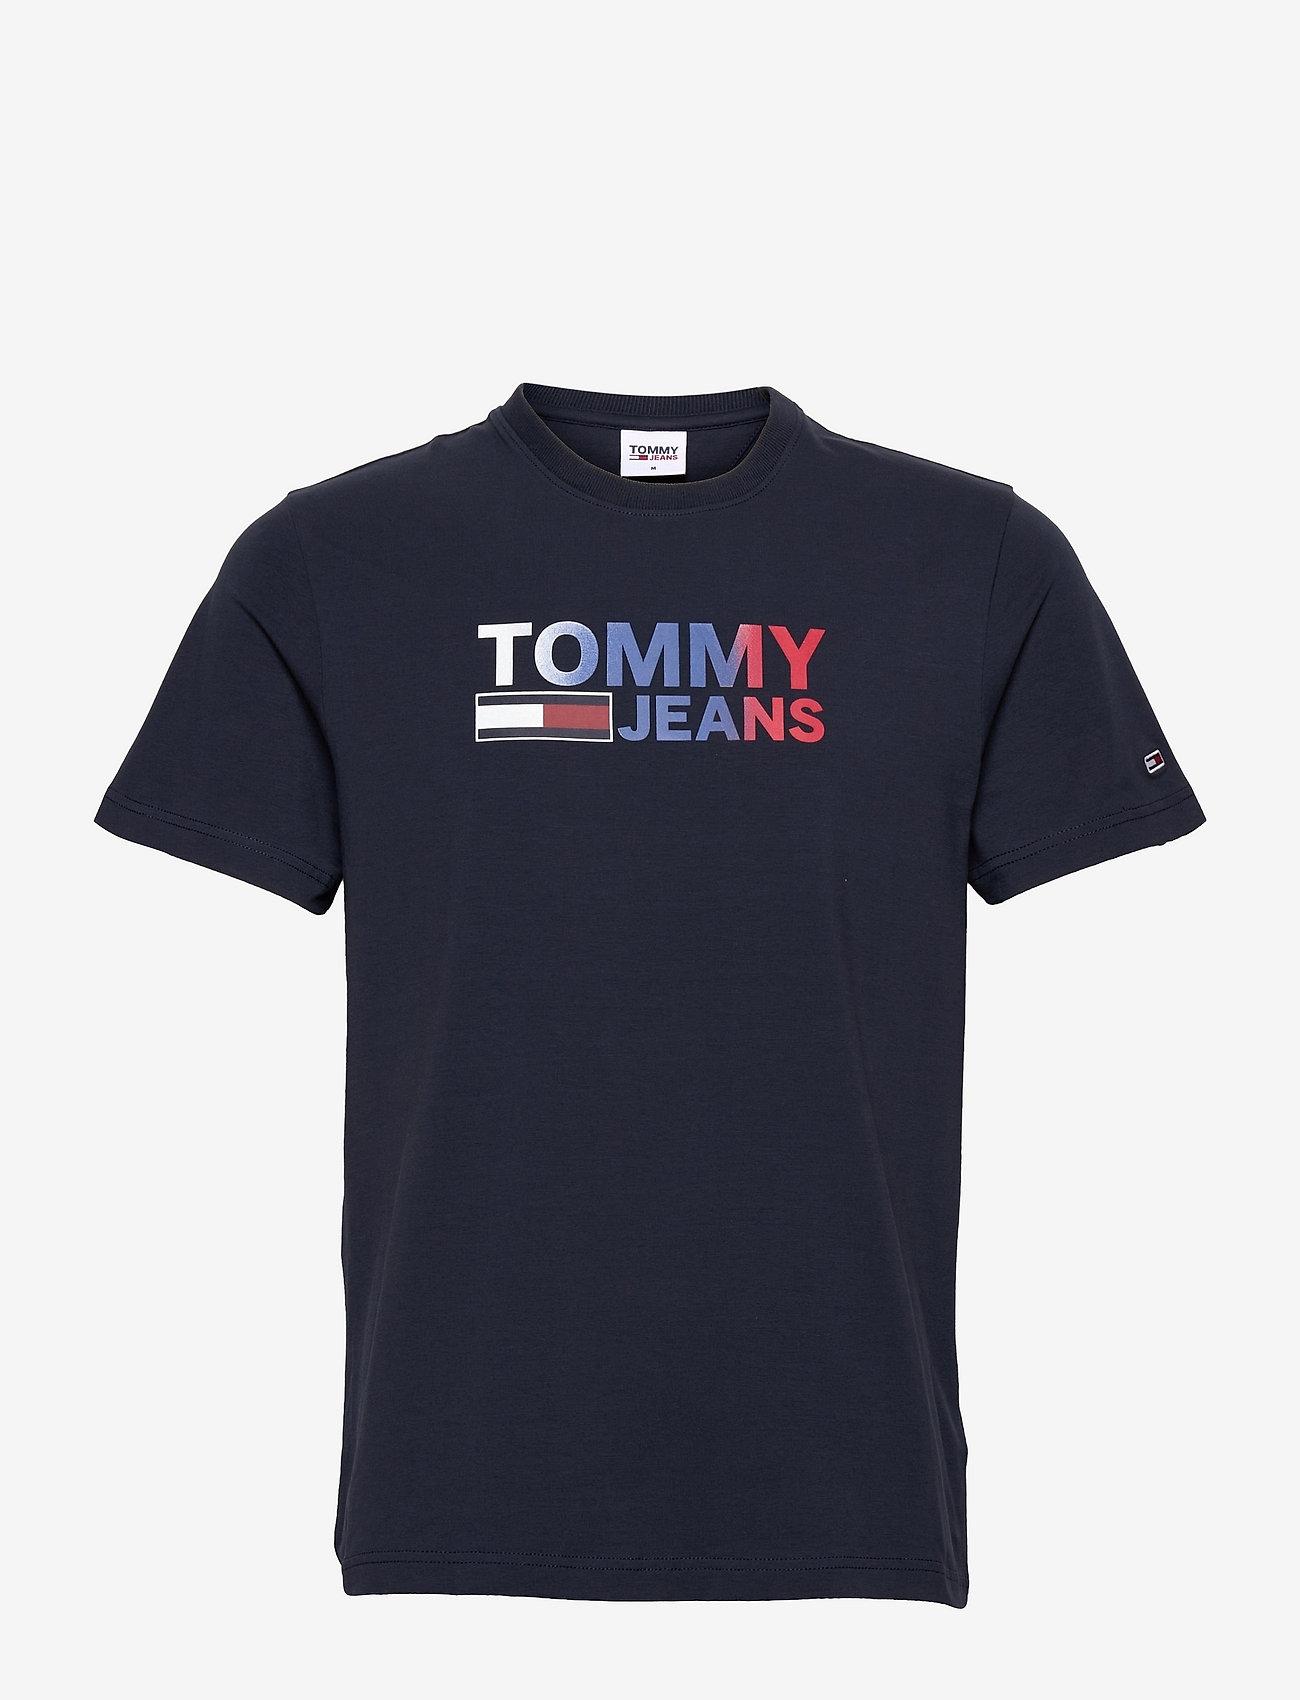 Tommy Jeans - TJM COLOR CORP LOGO TEE - kortärmade t-shirts - twilight navy - 0